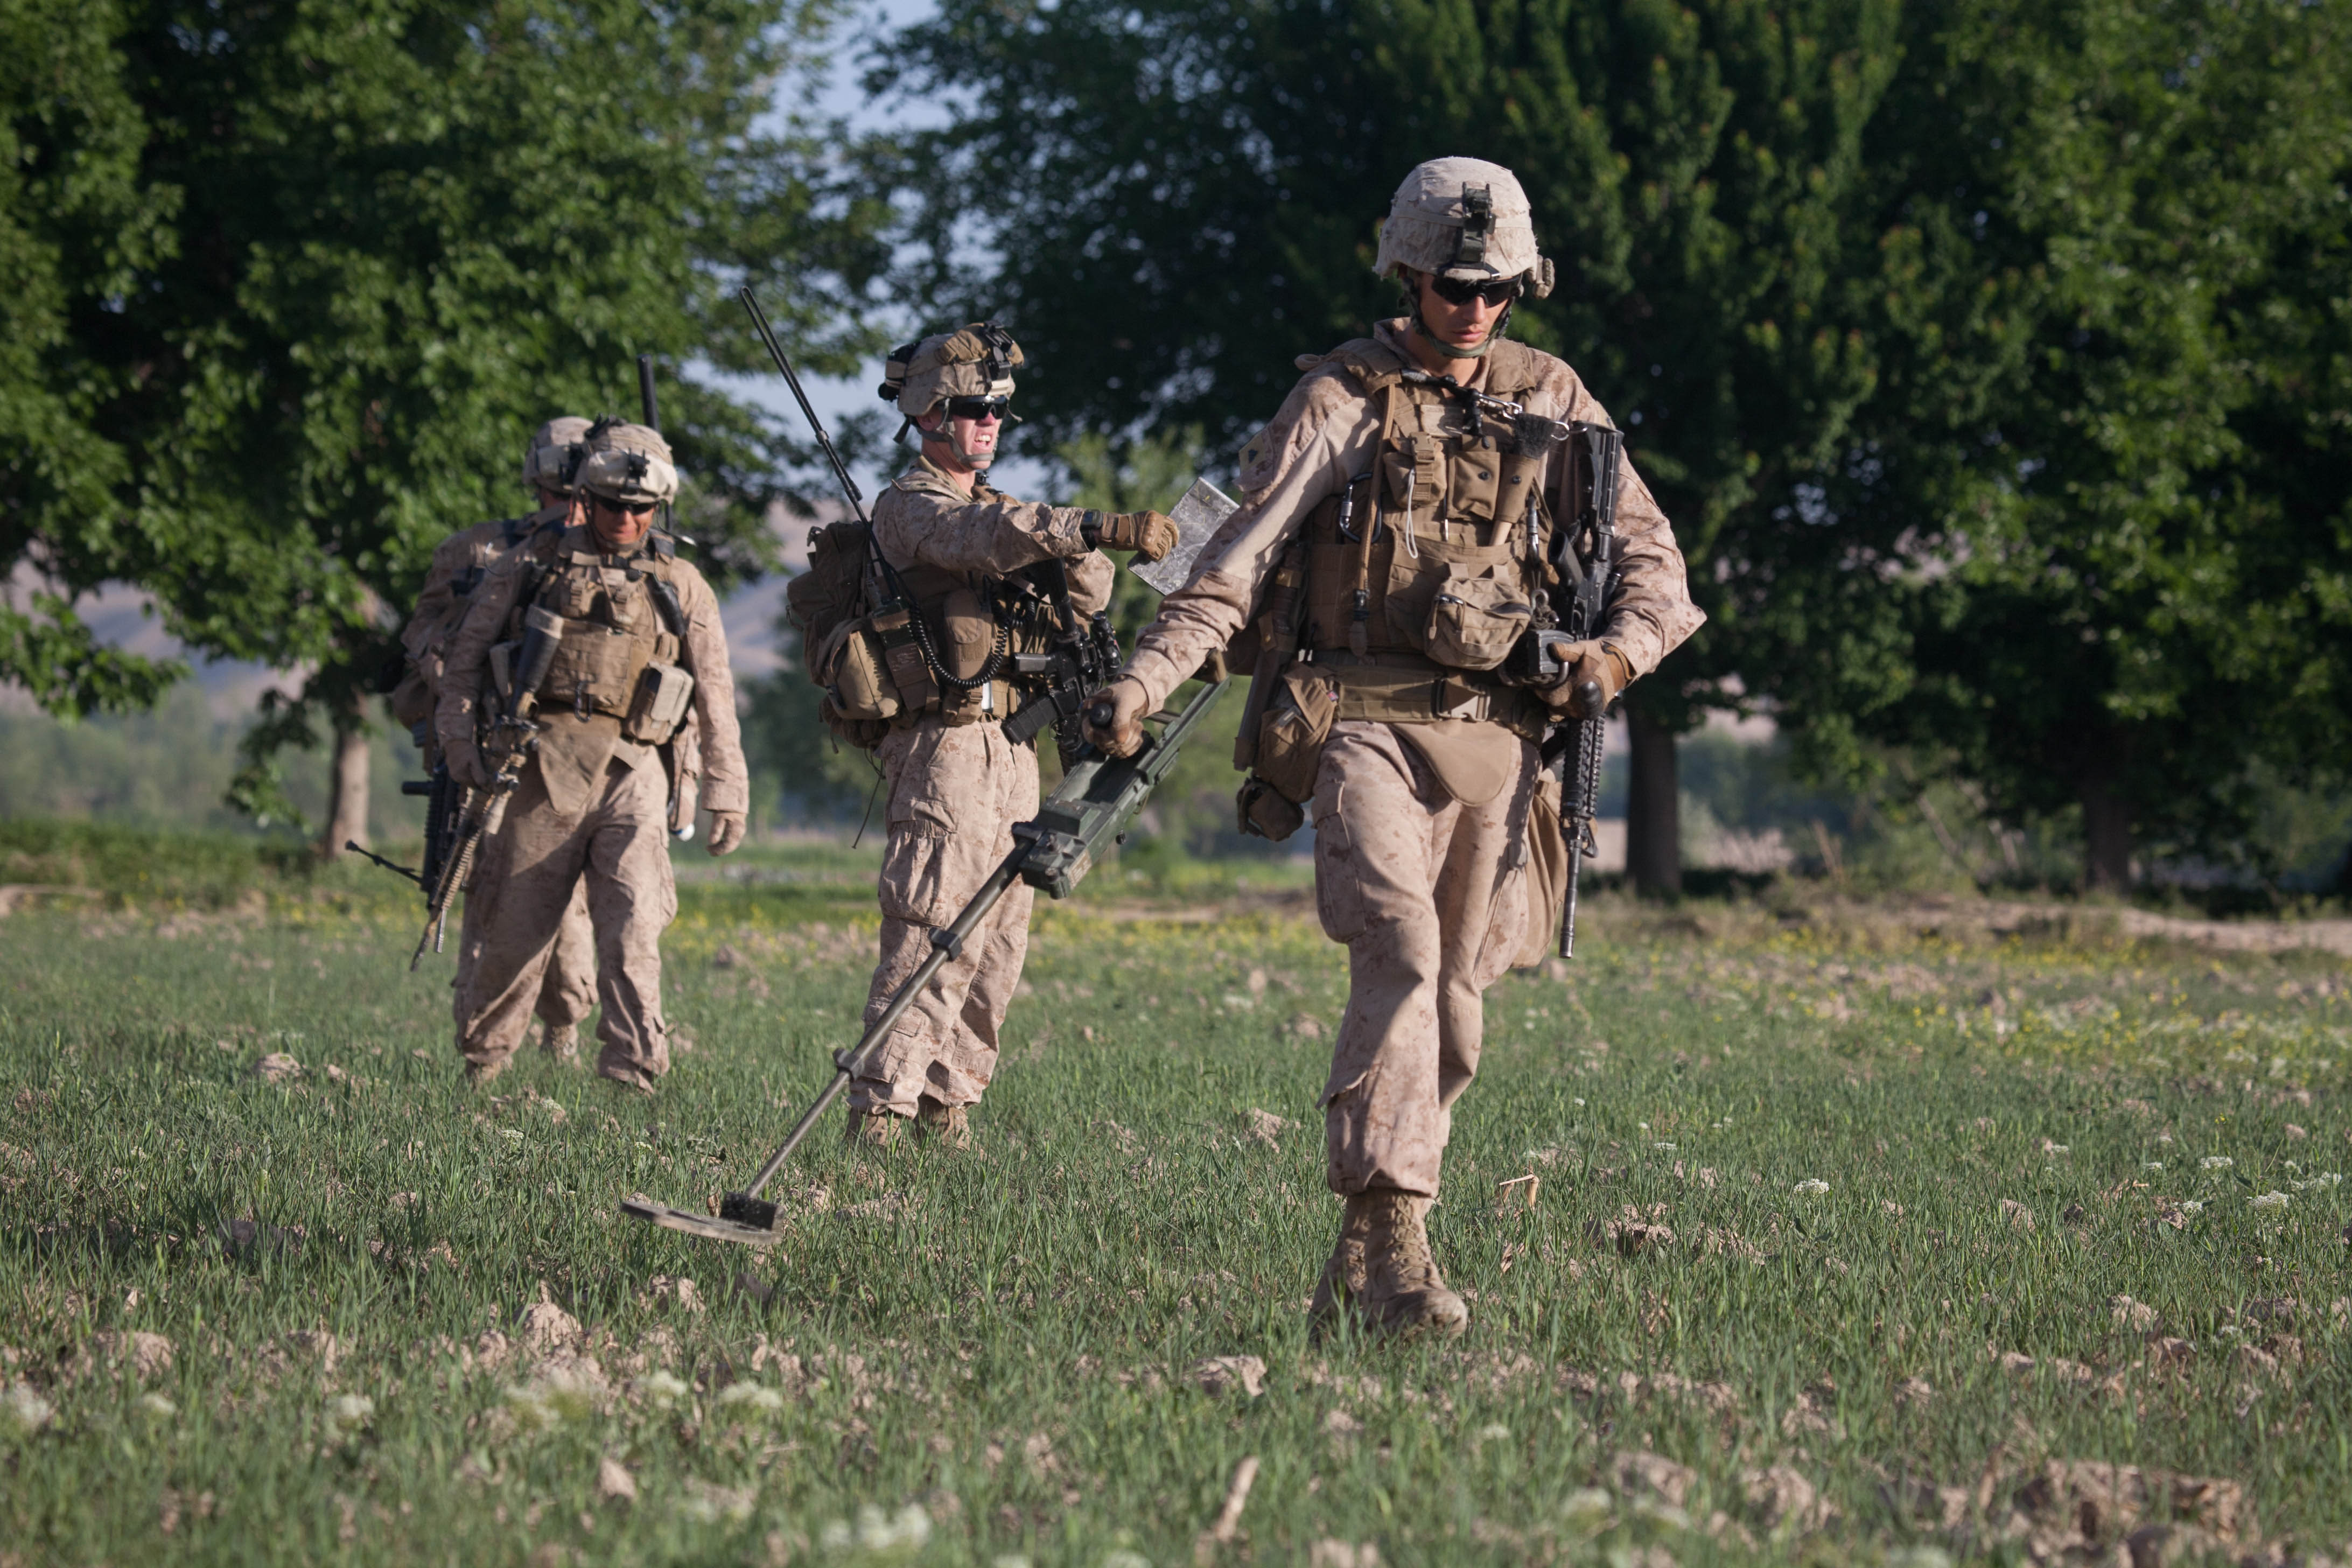 File:Defense.gov News Photo 110422-M-QZ858-065 - U.S. Marine Corps ...